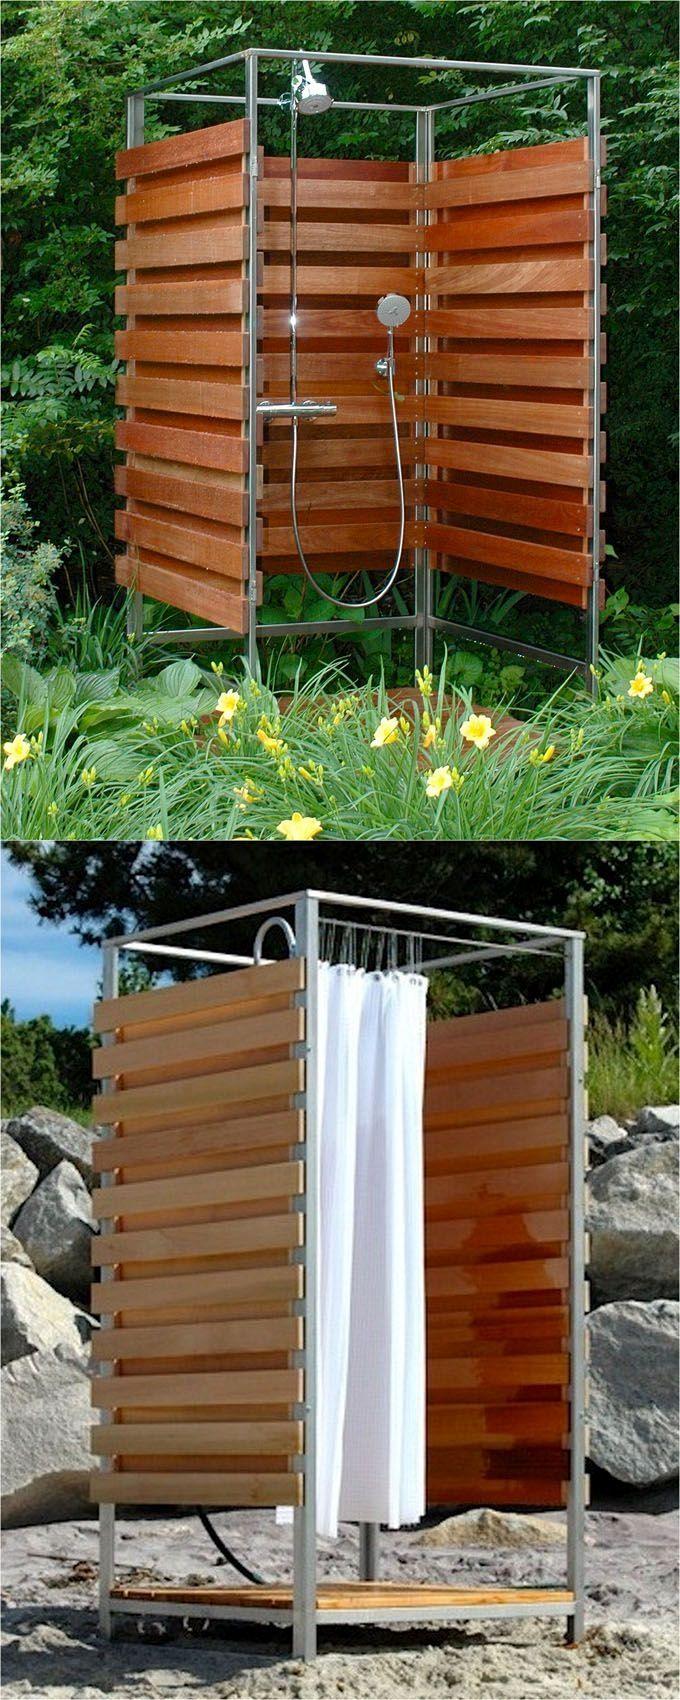 48 Fresh Outdoor Shower Ideas Outdoor Shower Diy Outdoor Shower Enclosure Outdoor Bathrooms